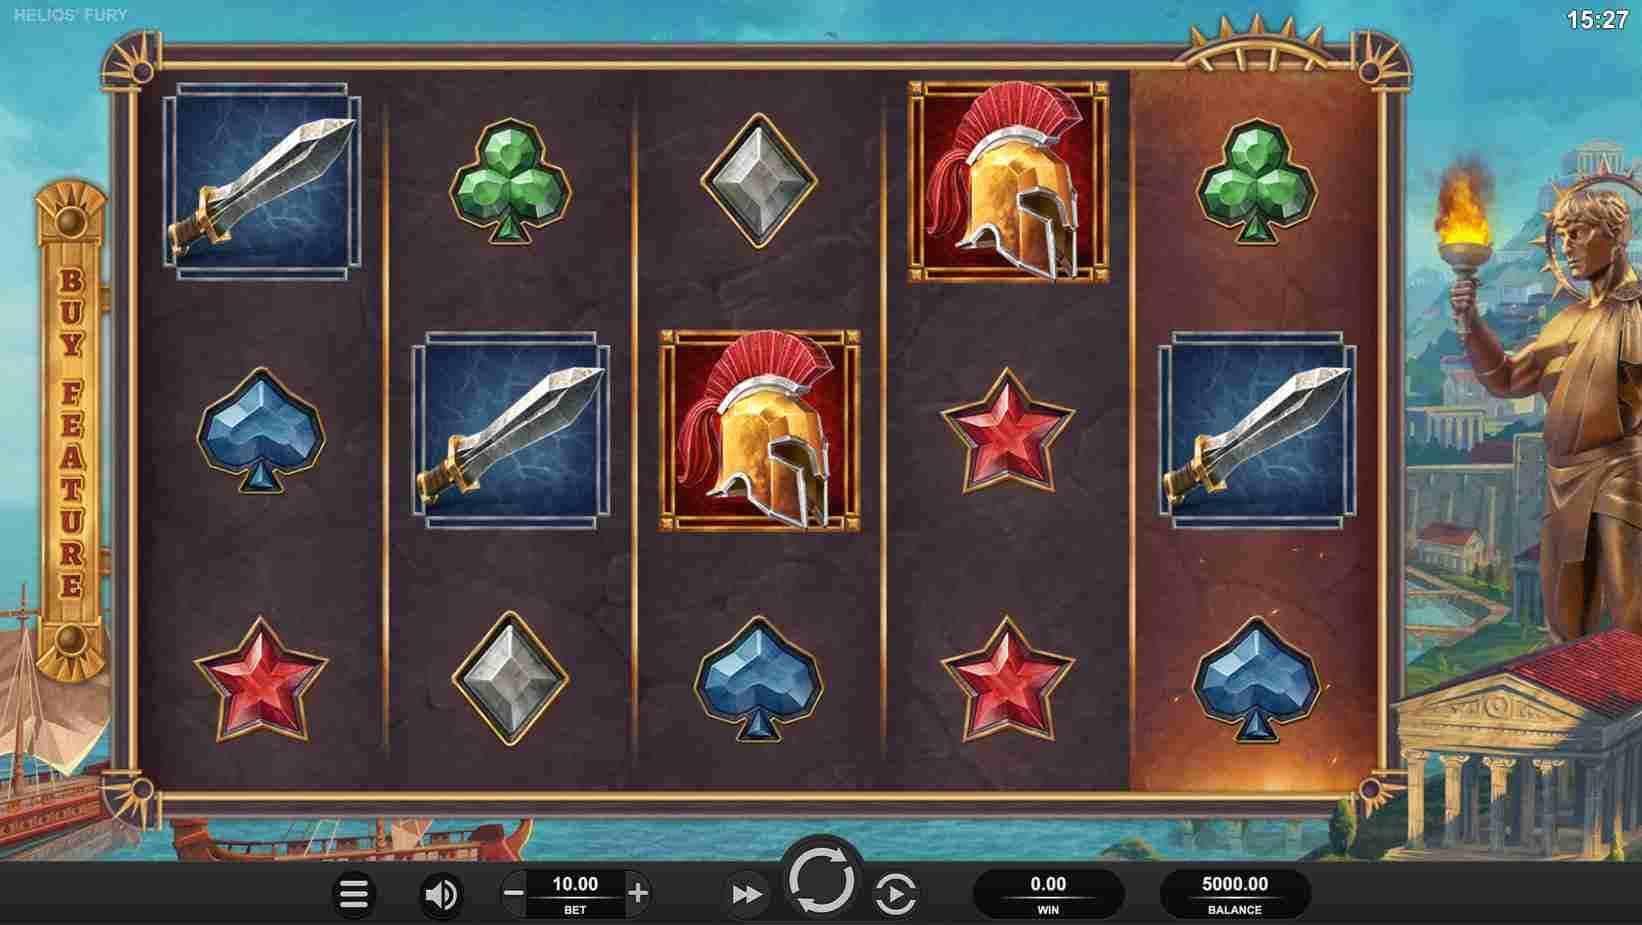 Helios Fury Base Game